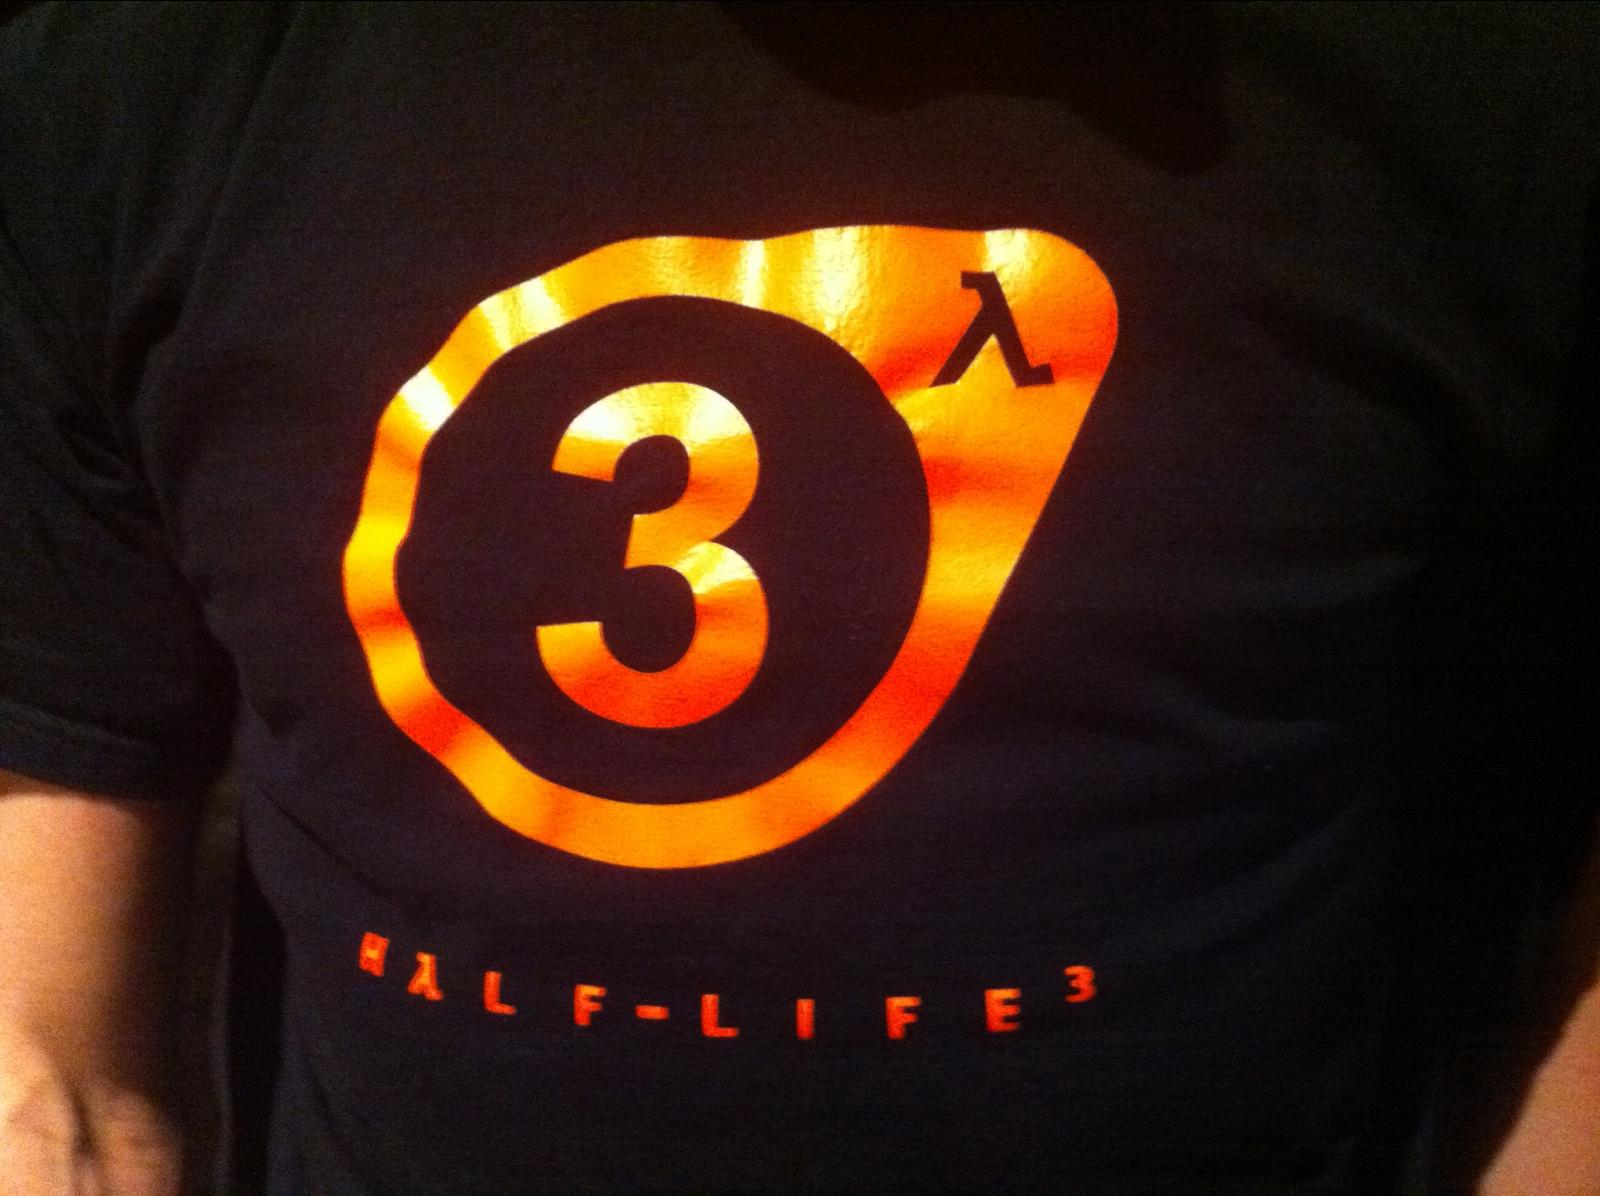 Zaposlenik Valvea viđen sa Half Life 3 majicom